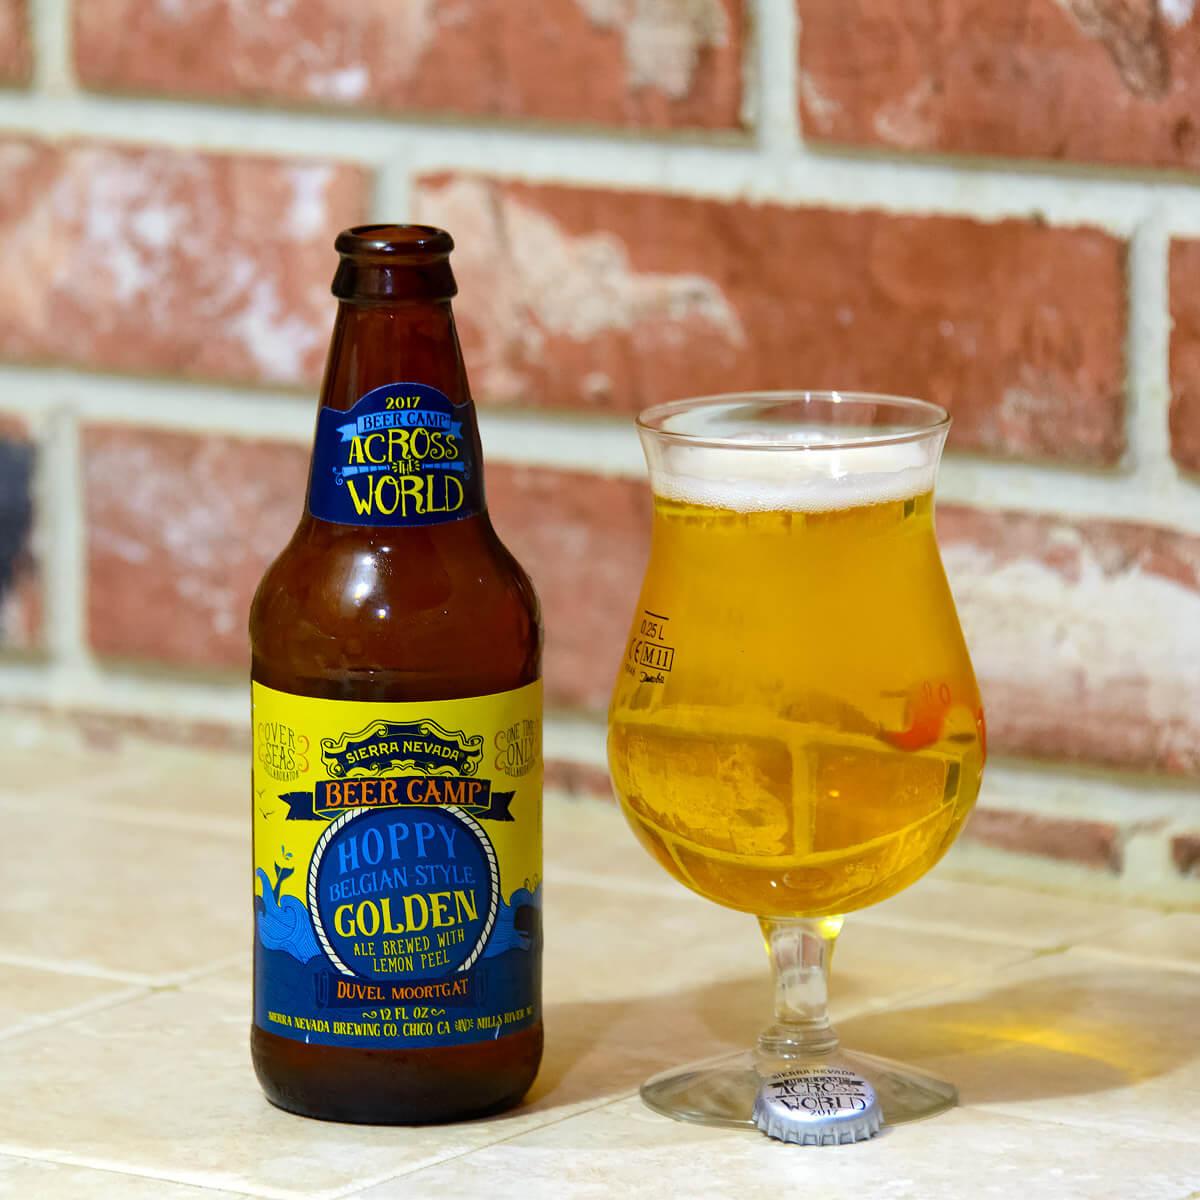 Hoppy Belgian-style Golden Ale by Sierra Nevada Brewing Co. and Duvel Moortgat